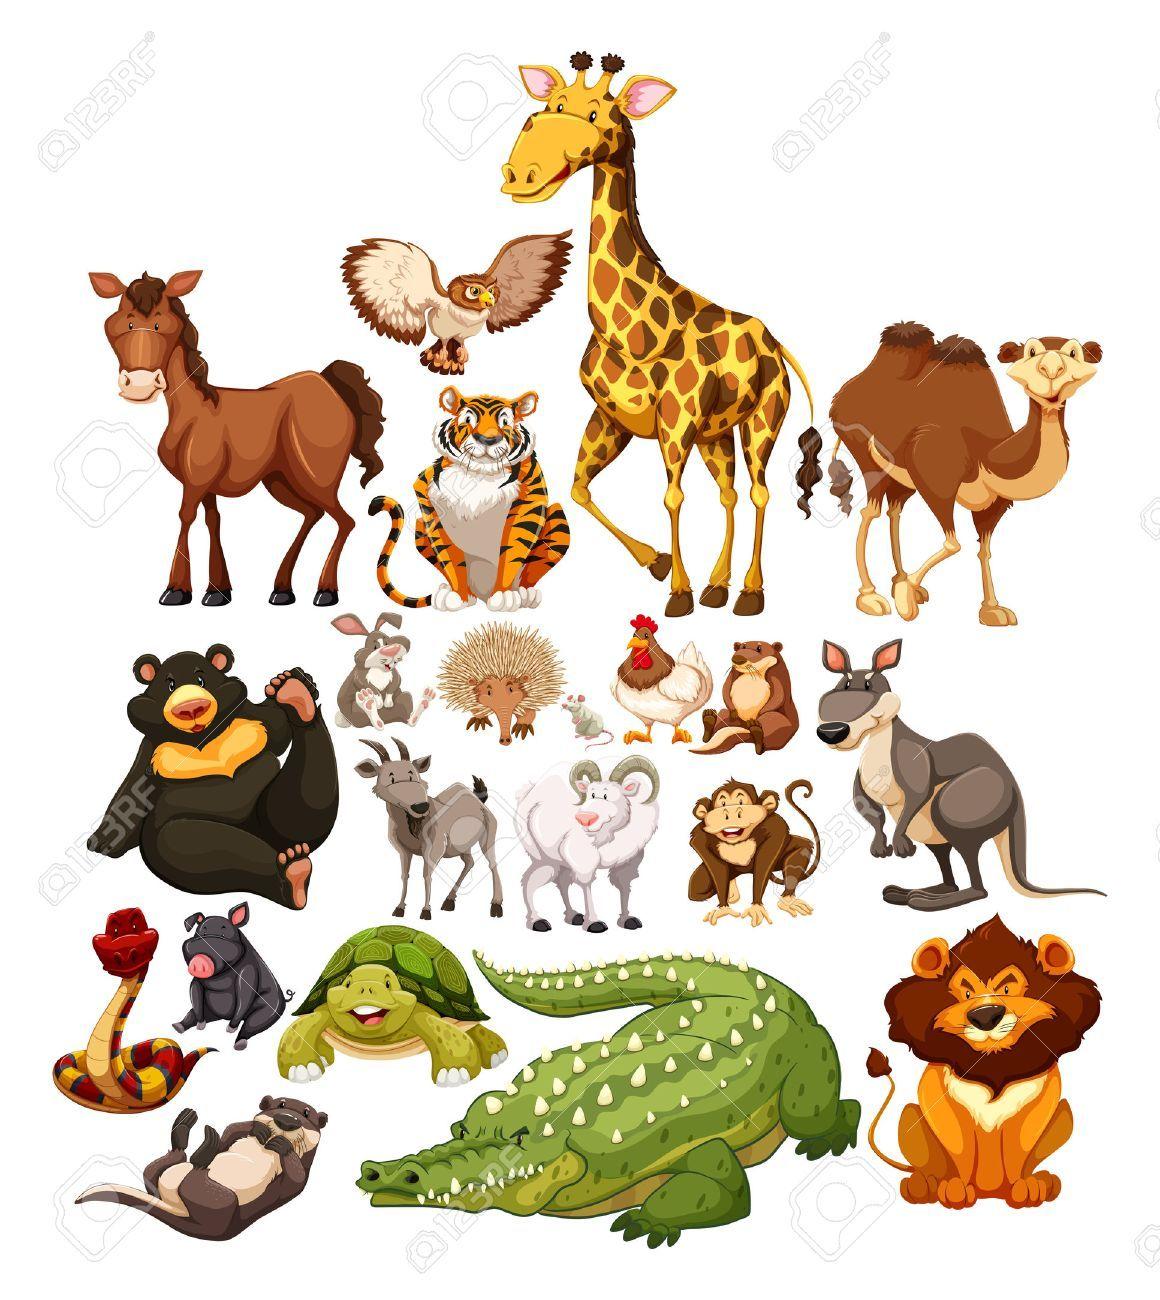 Different Type Of Wild Animals Illustration Illustration Ad Wild Type Animals Illustration Il Wild Animals Vector Animal Illustration Animals Wild